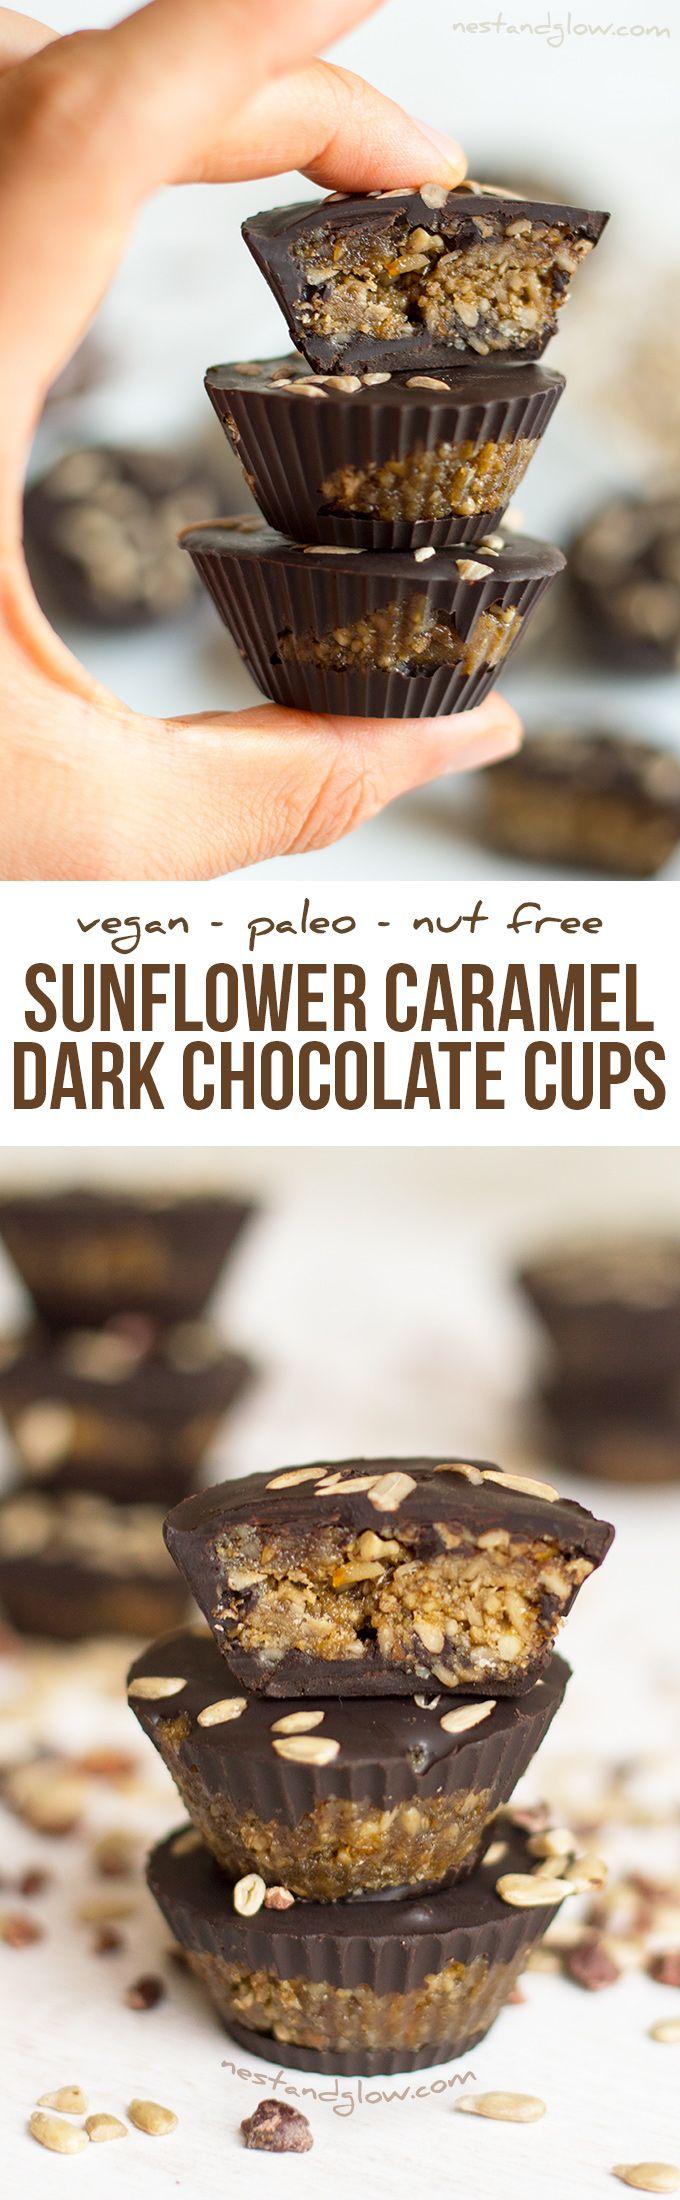 Sunflower Caramel Dark Chocolate Cups Recipe - Nut-free, Paleo and Dairy-free via @nestandglow